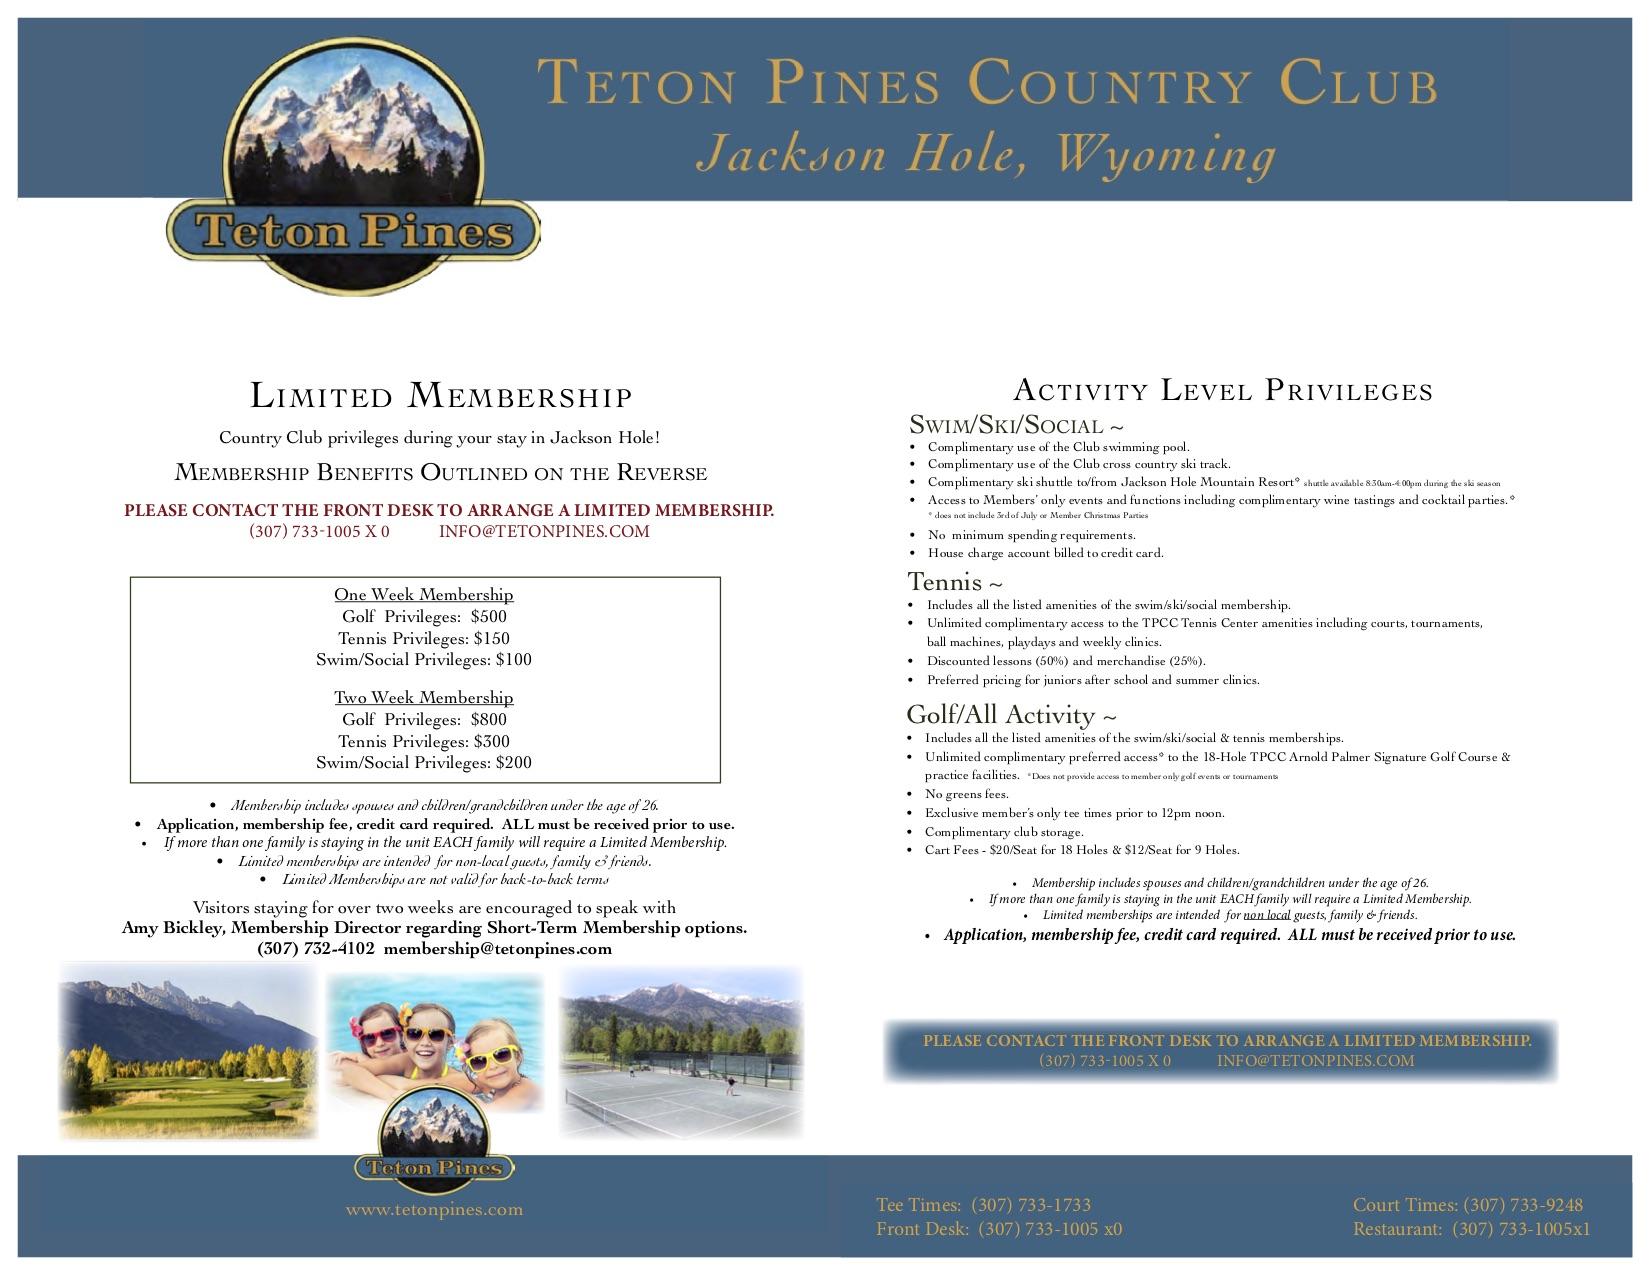 Teton Pines Limited Membership